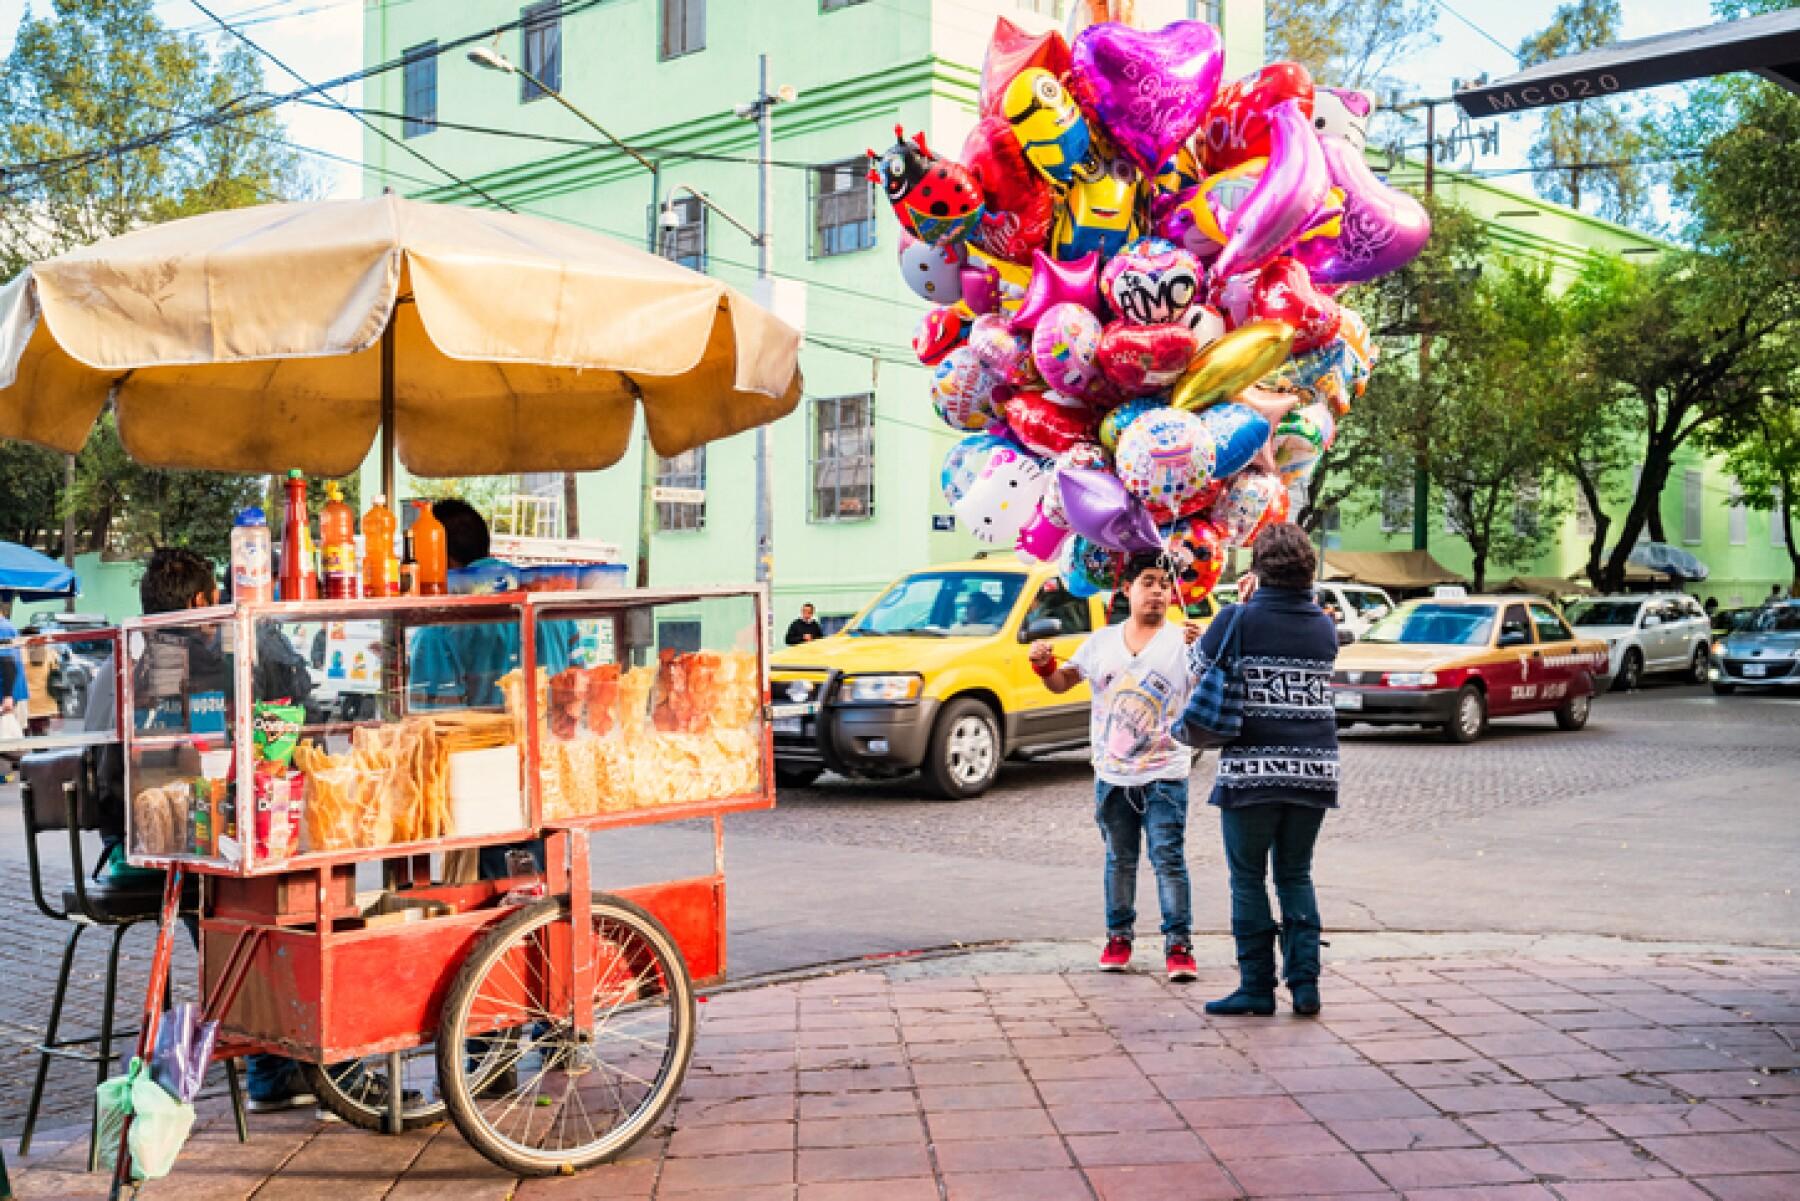 Vendors in the Coyoacan neighborhood of Mexico City